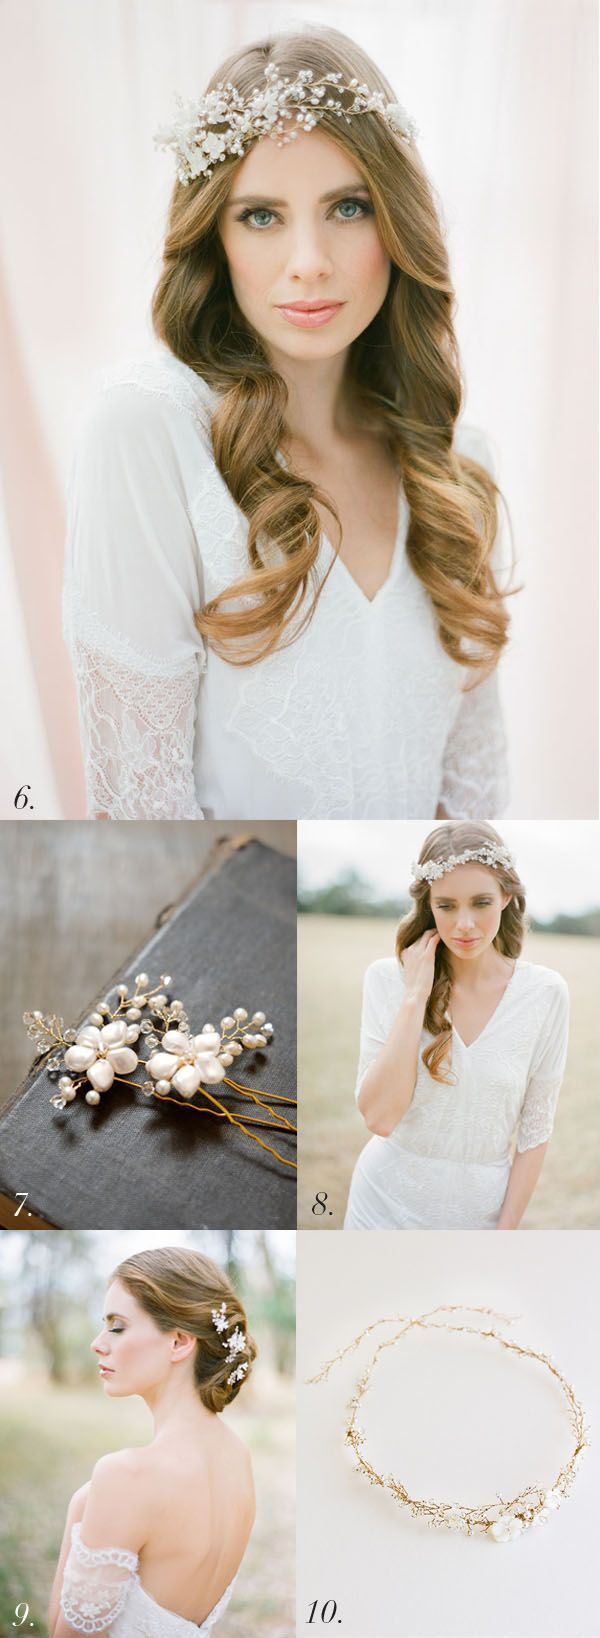 Rose gold wedding hair accessories - 25 Best Ideas About Bridal Headpieces On Pinterest Wedding Hair Accessories Bridal Hair Accessories And Wedding Bridal Bouquet